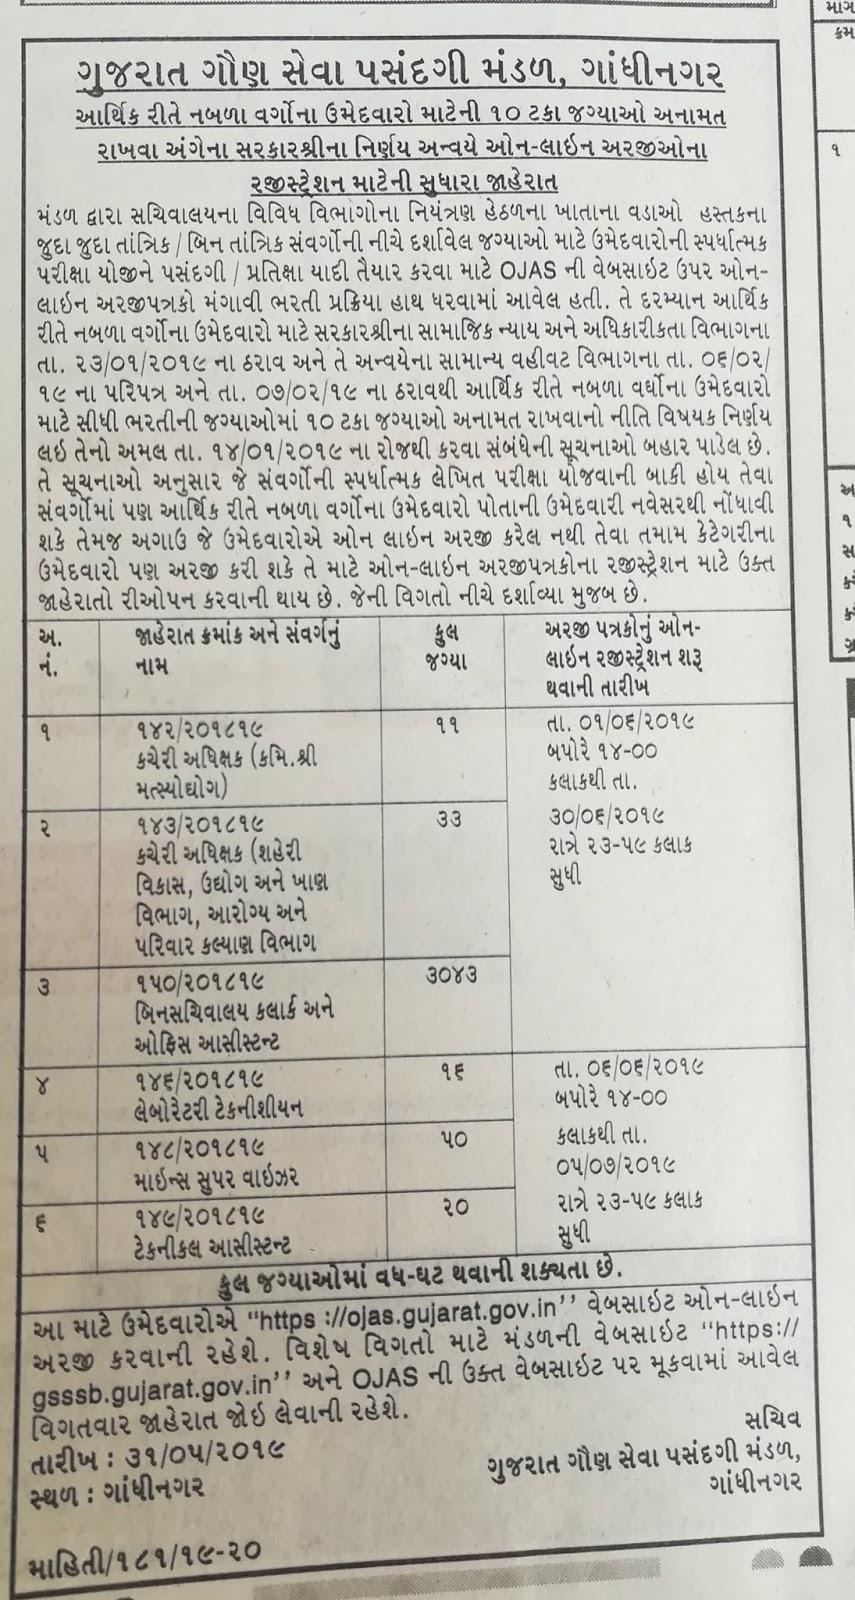 3043 Bin sachi balay clerk bharti